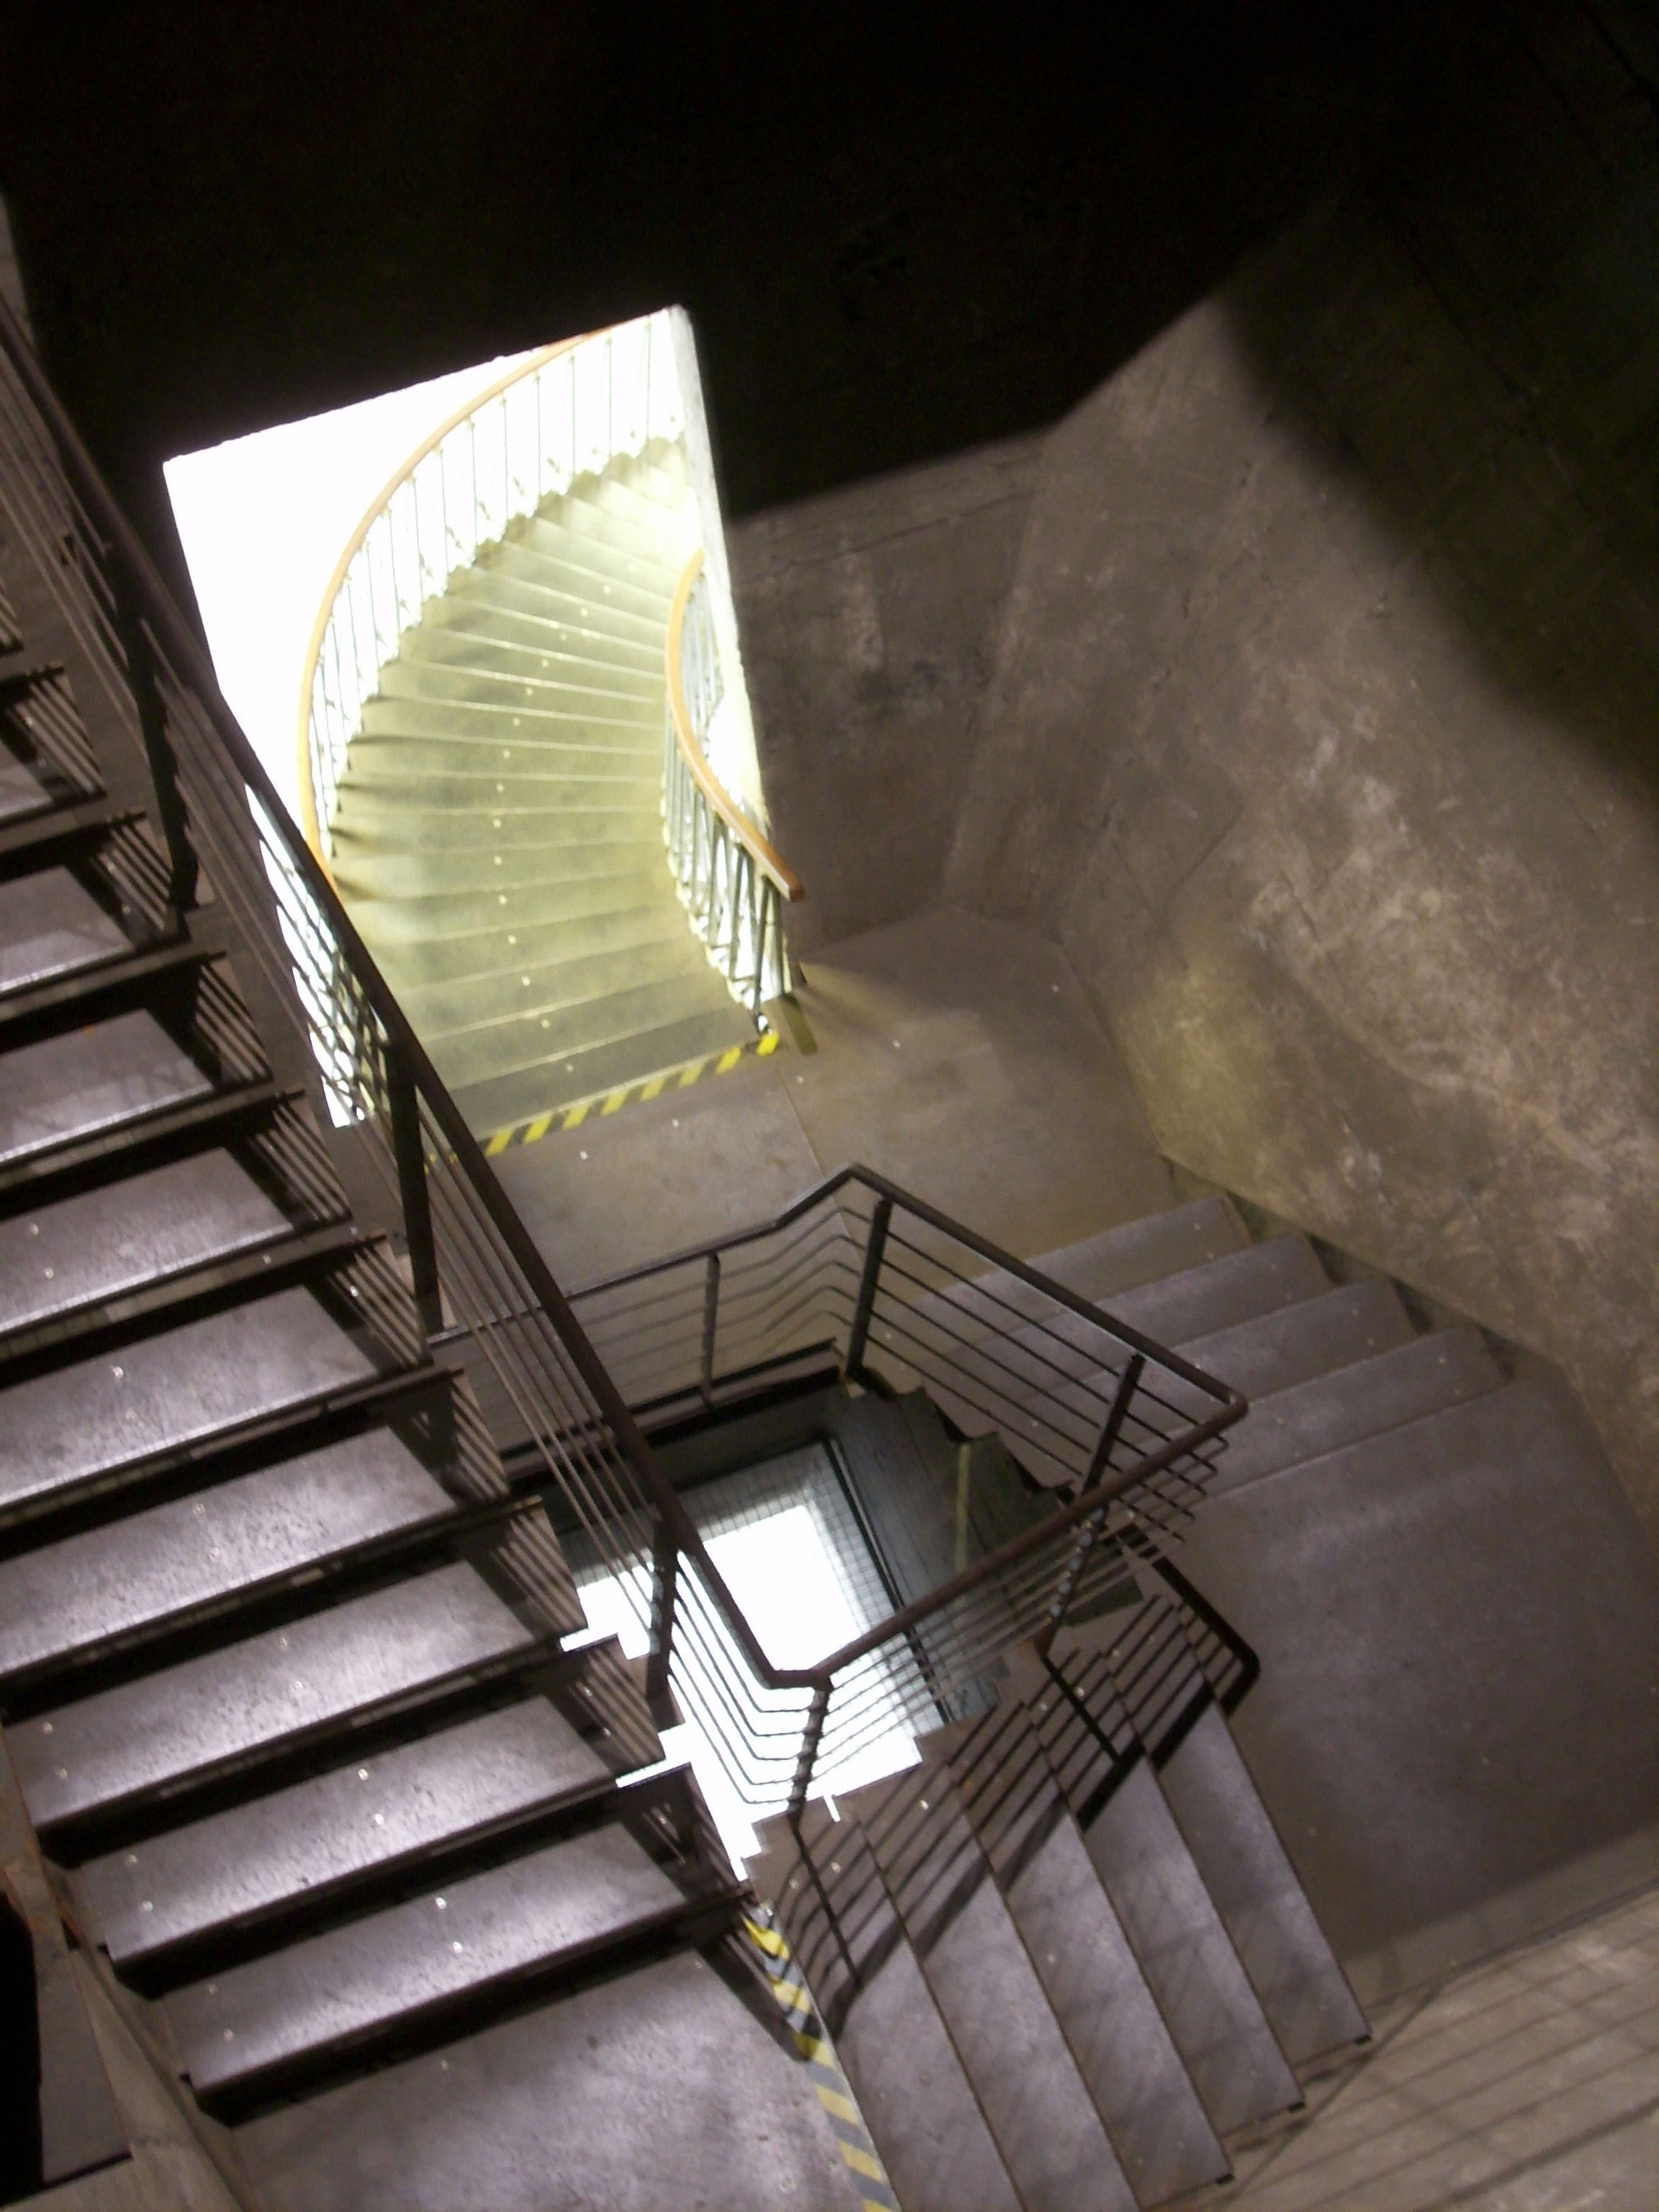 File Kokerei Zollverein Kohlenmischung Modernes Treppenhaus Jpg